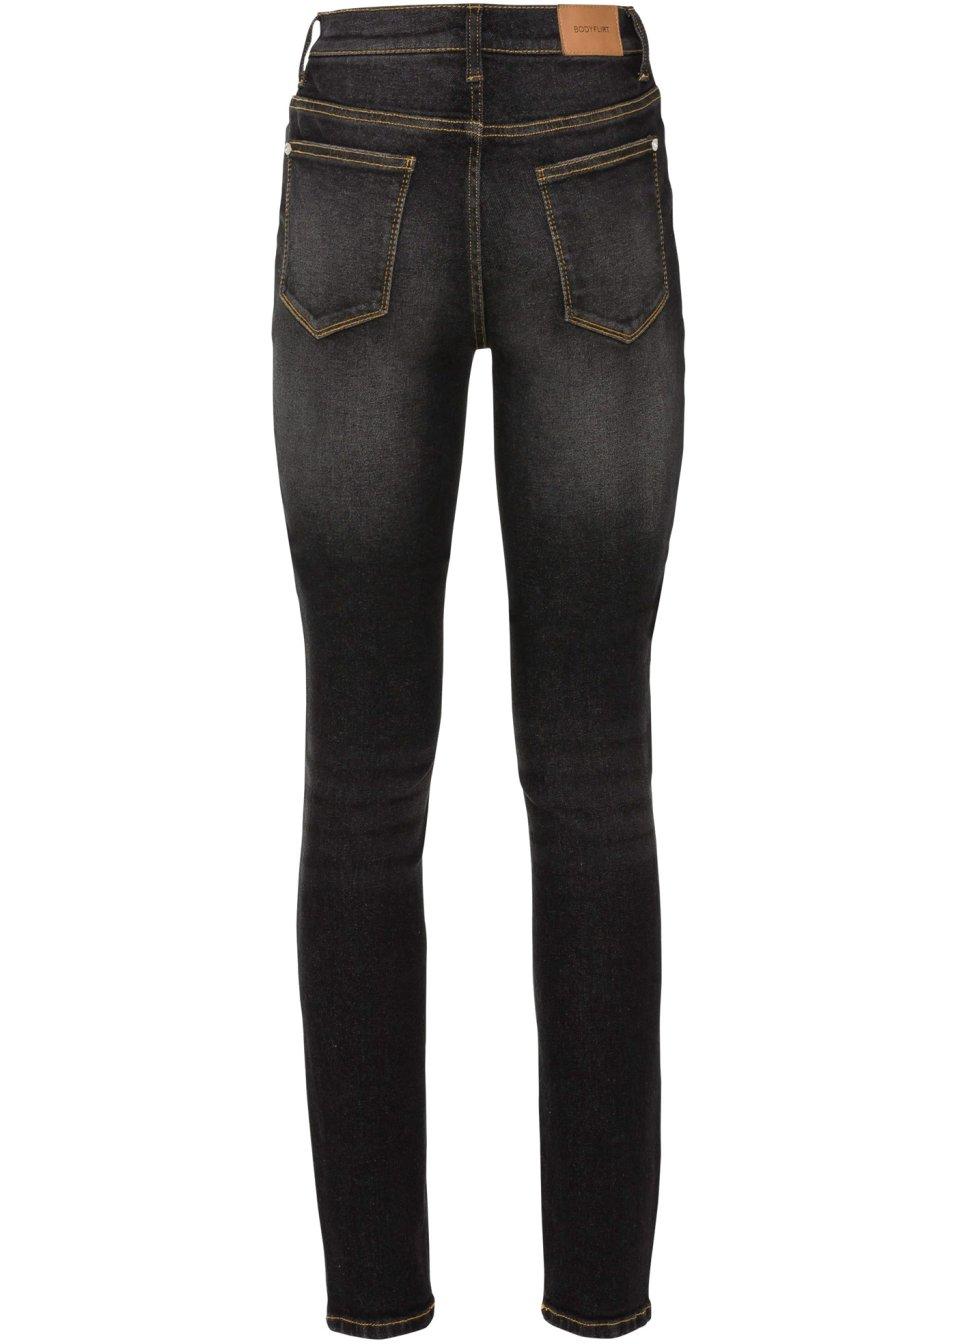 Mode Femme Vêtements DJLfdOFlkj Jean Skinny mode à taille haute noir stone